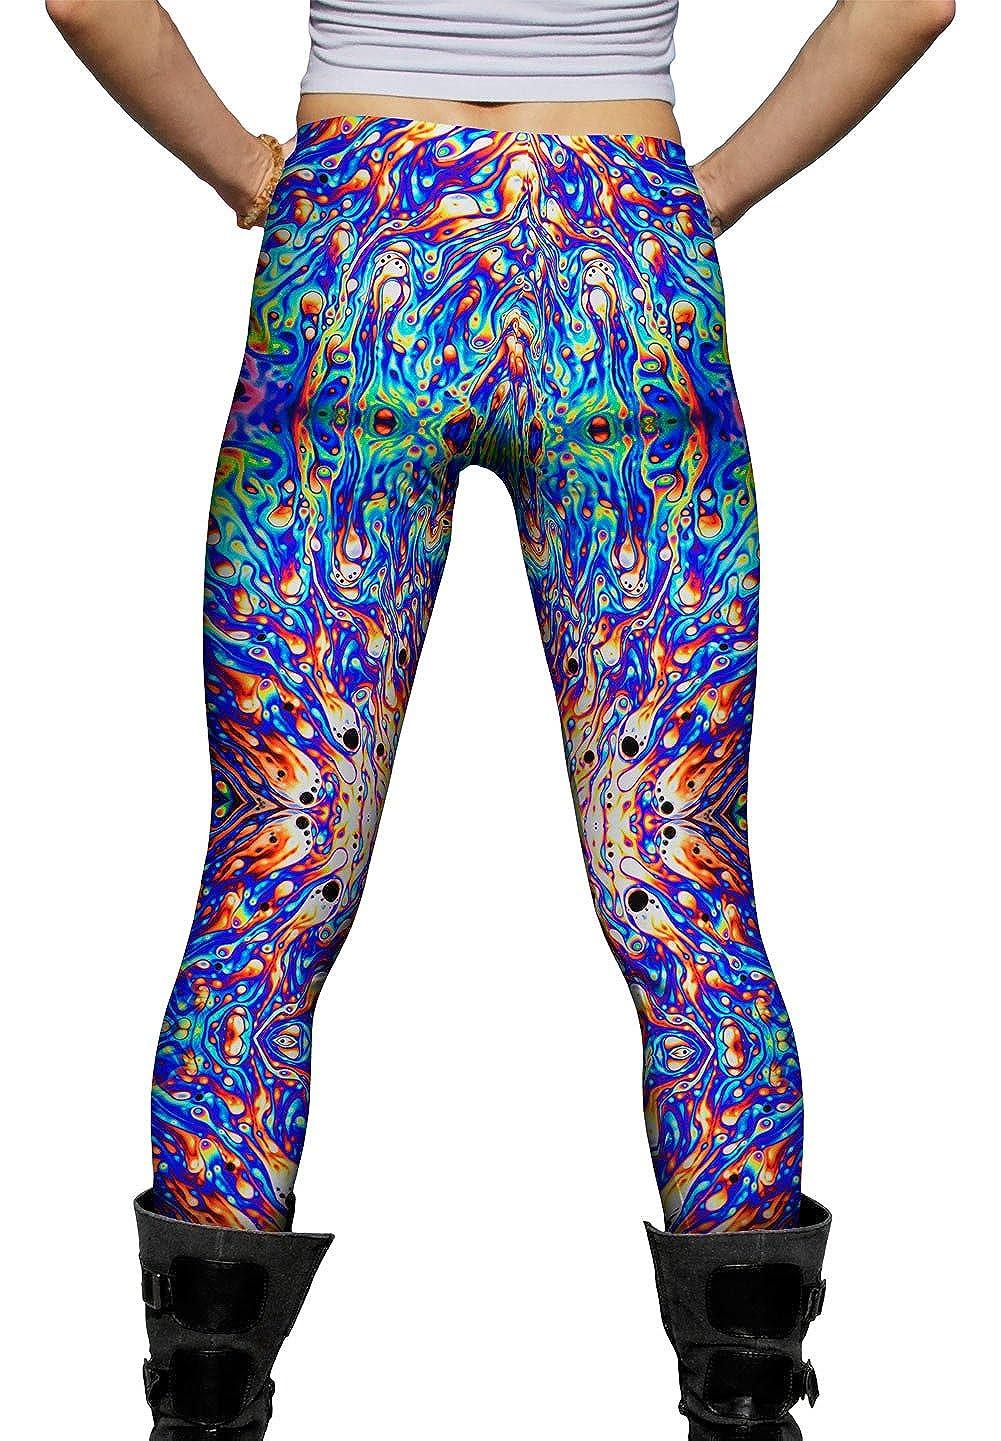 Psychedelic Neon Soap Party Violet Ladies Womens Leggings Yizzam